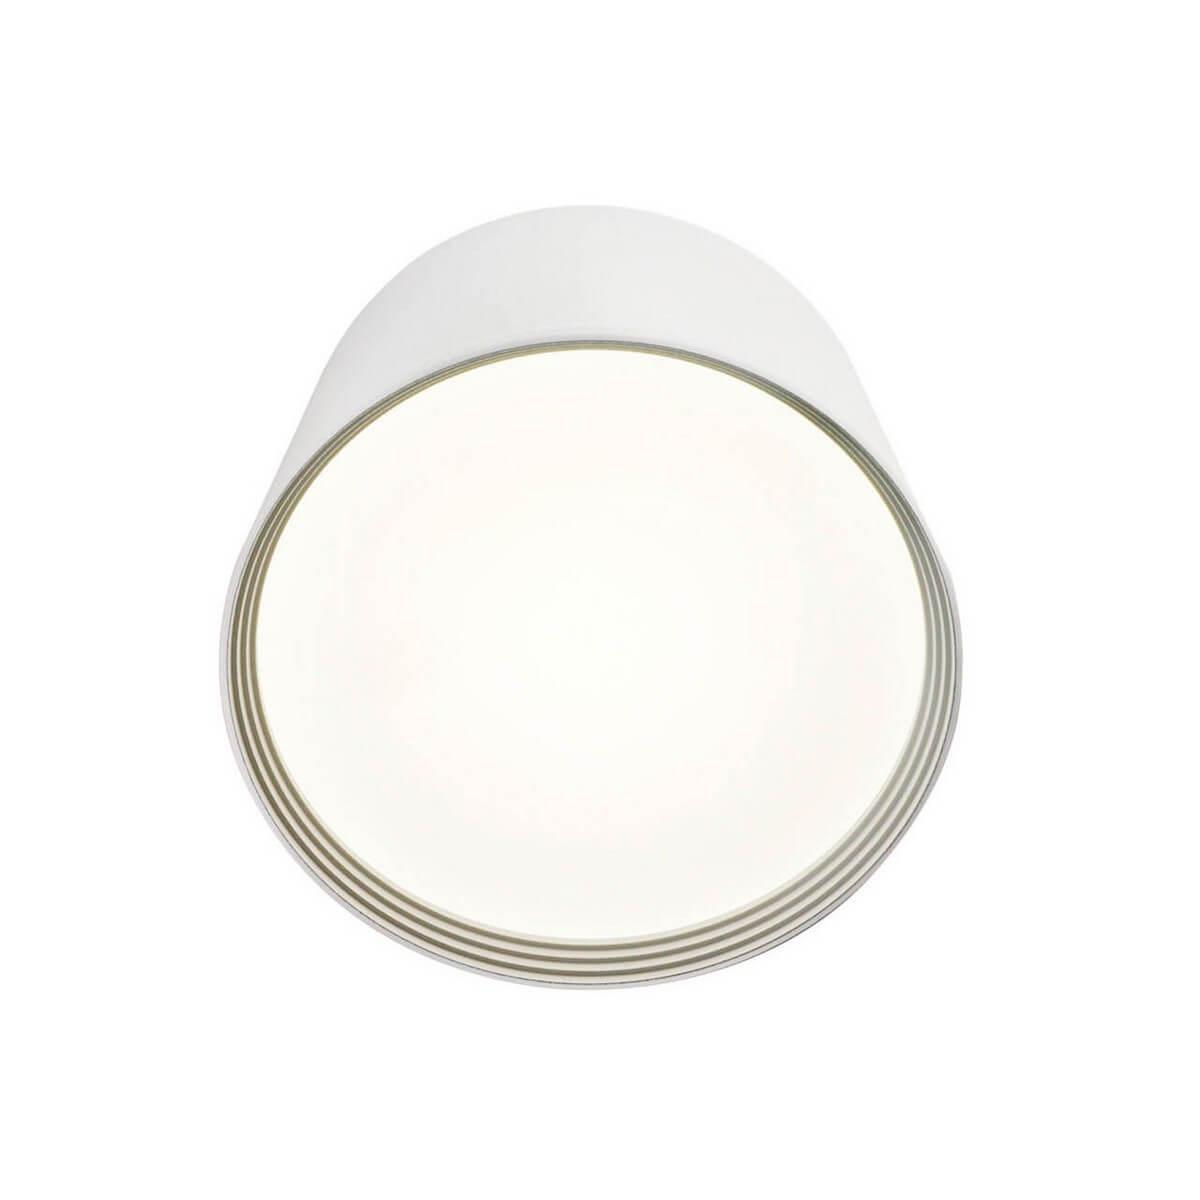 Фото - Накладной светильник Kink Light 05412,01, LED, 18 Вт накладной светильник kink light фейерверк 08013